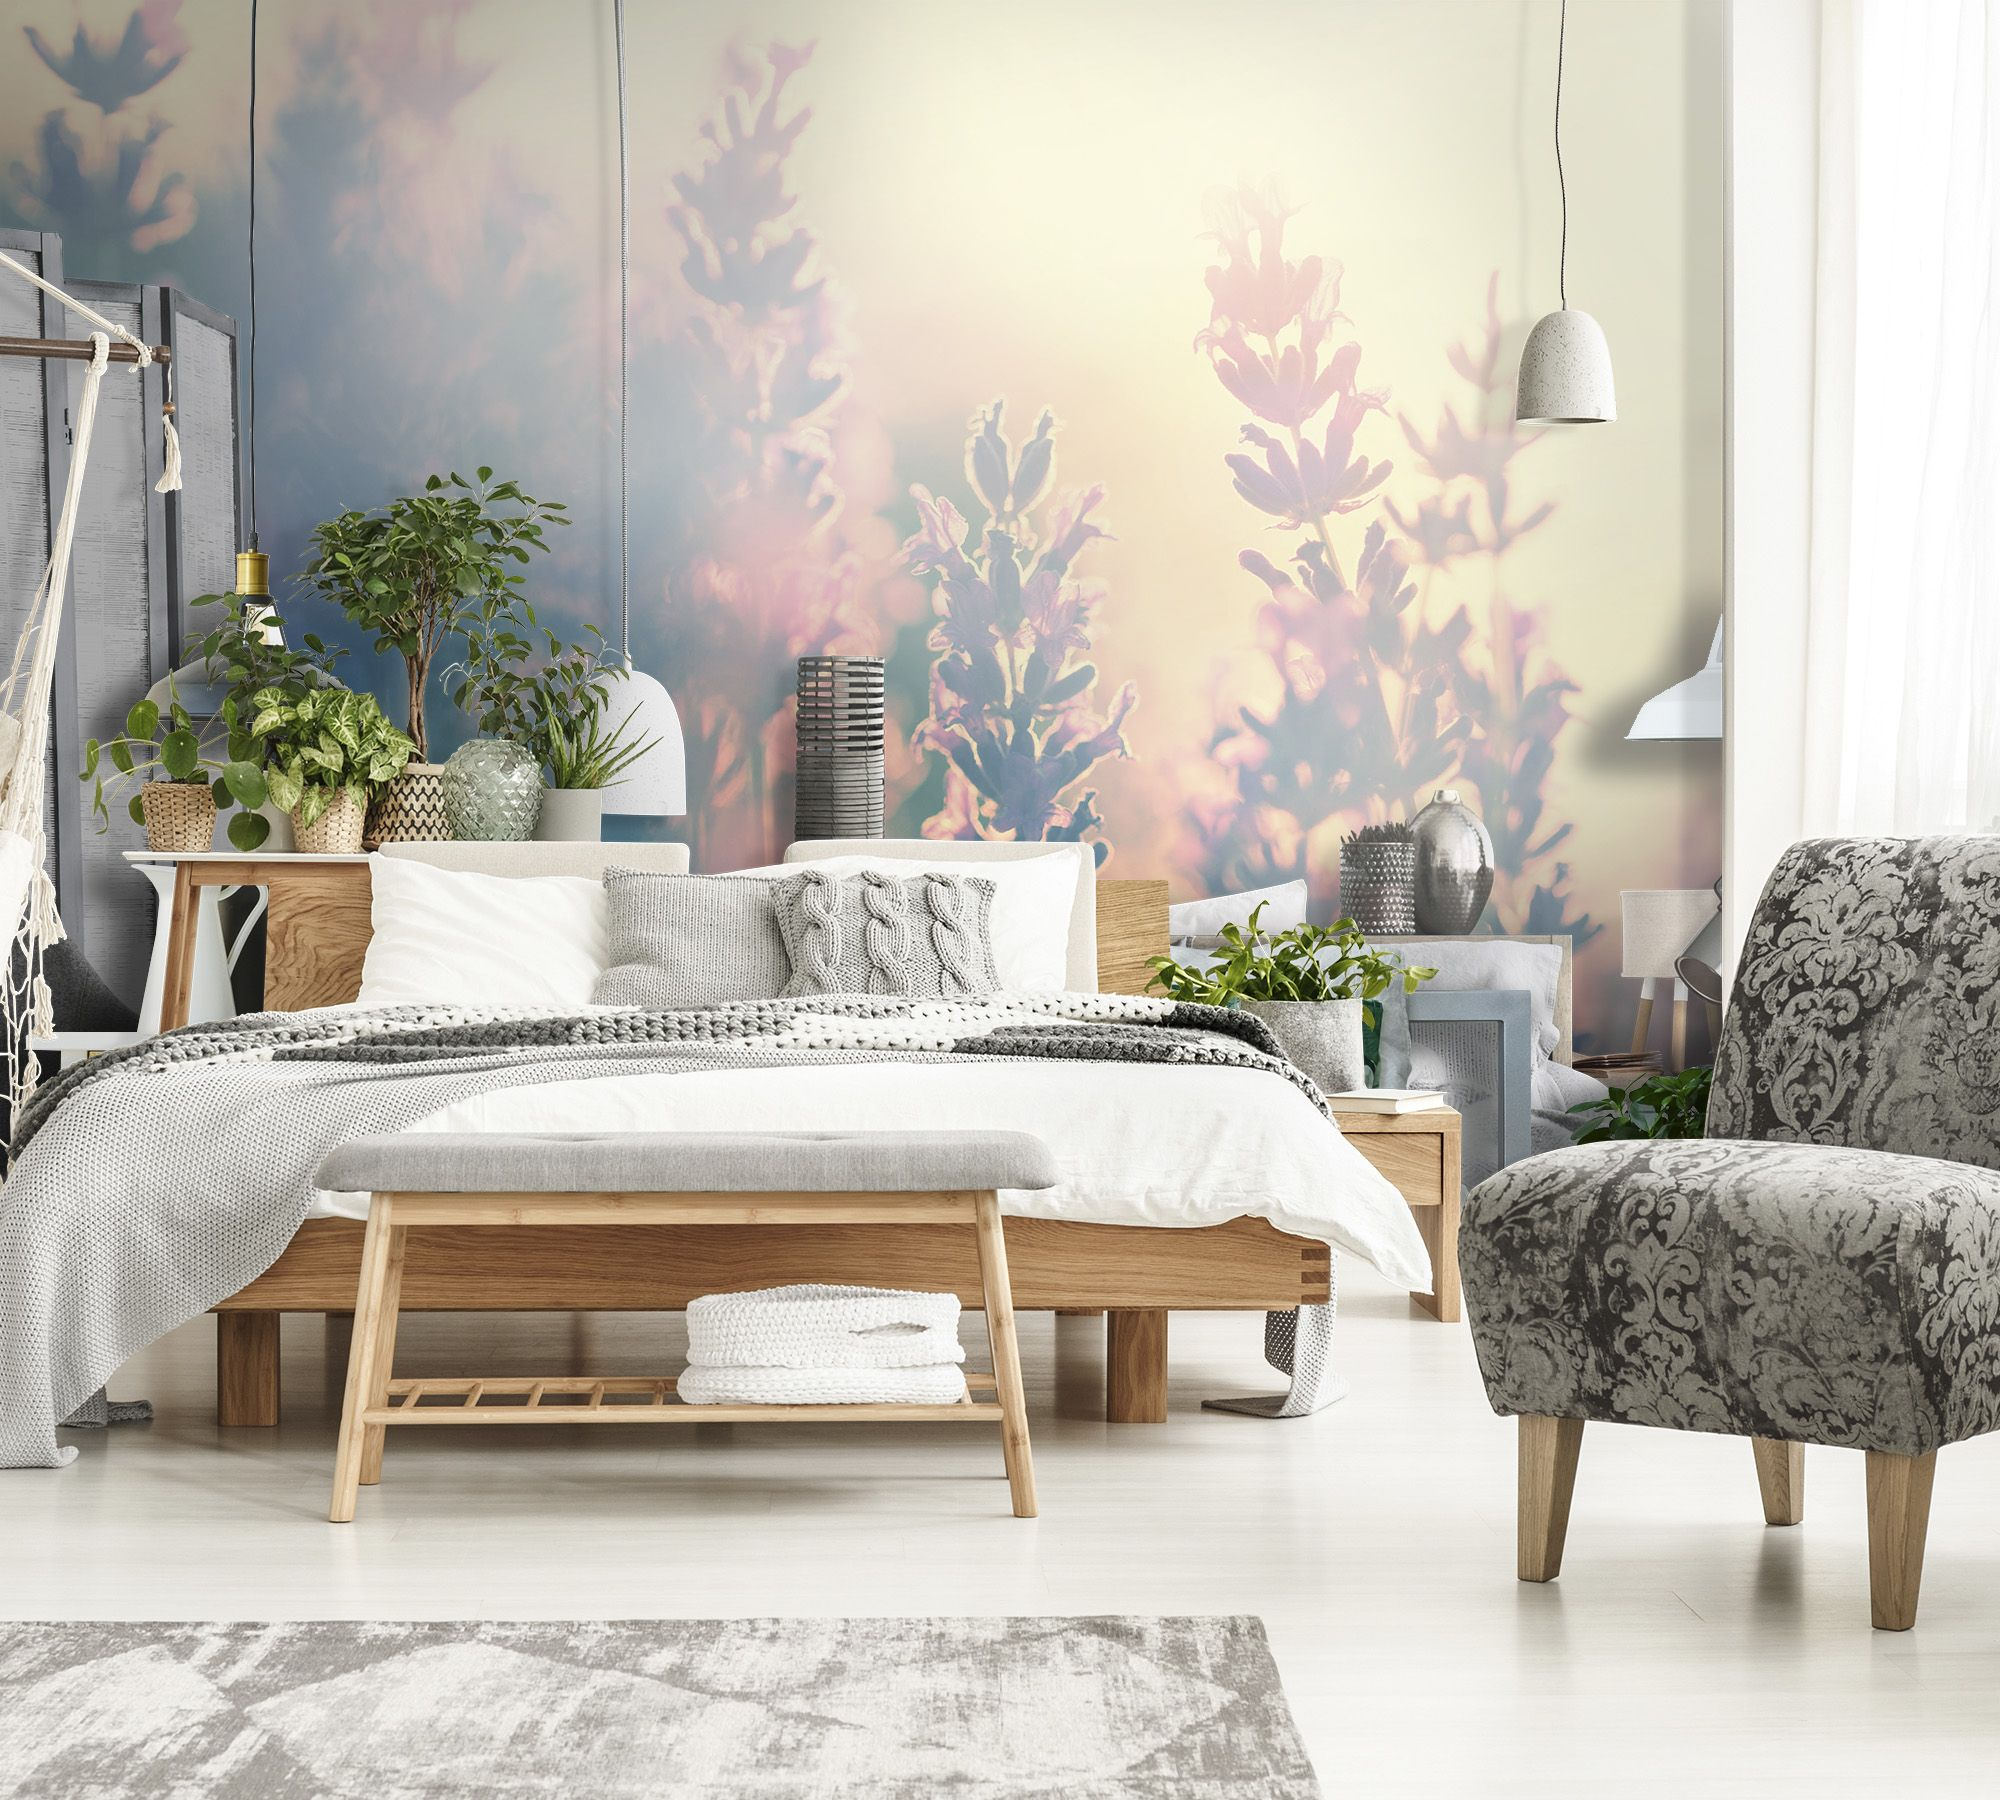 Fototapeta Lawenda Bedroom Wallpaper Colours Living Room Prints Pink Peonies Print